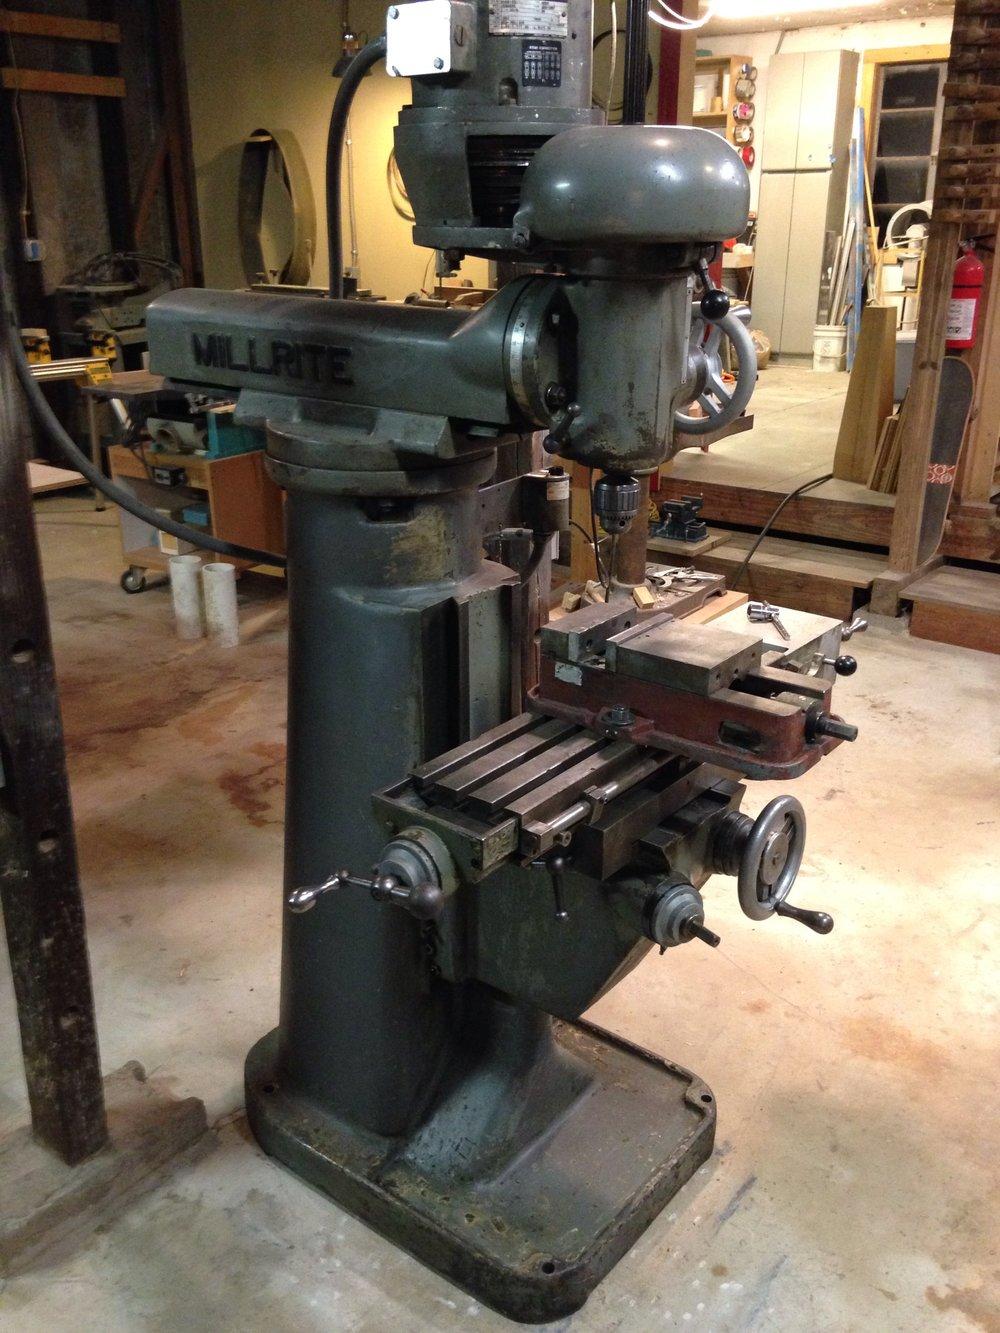 Burke millrite milling machine.